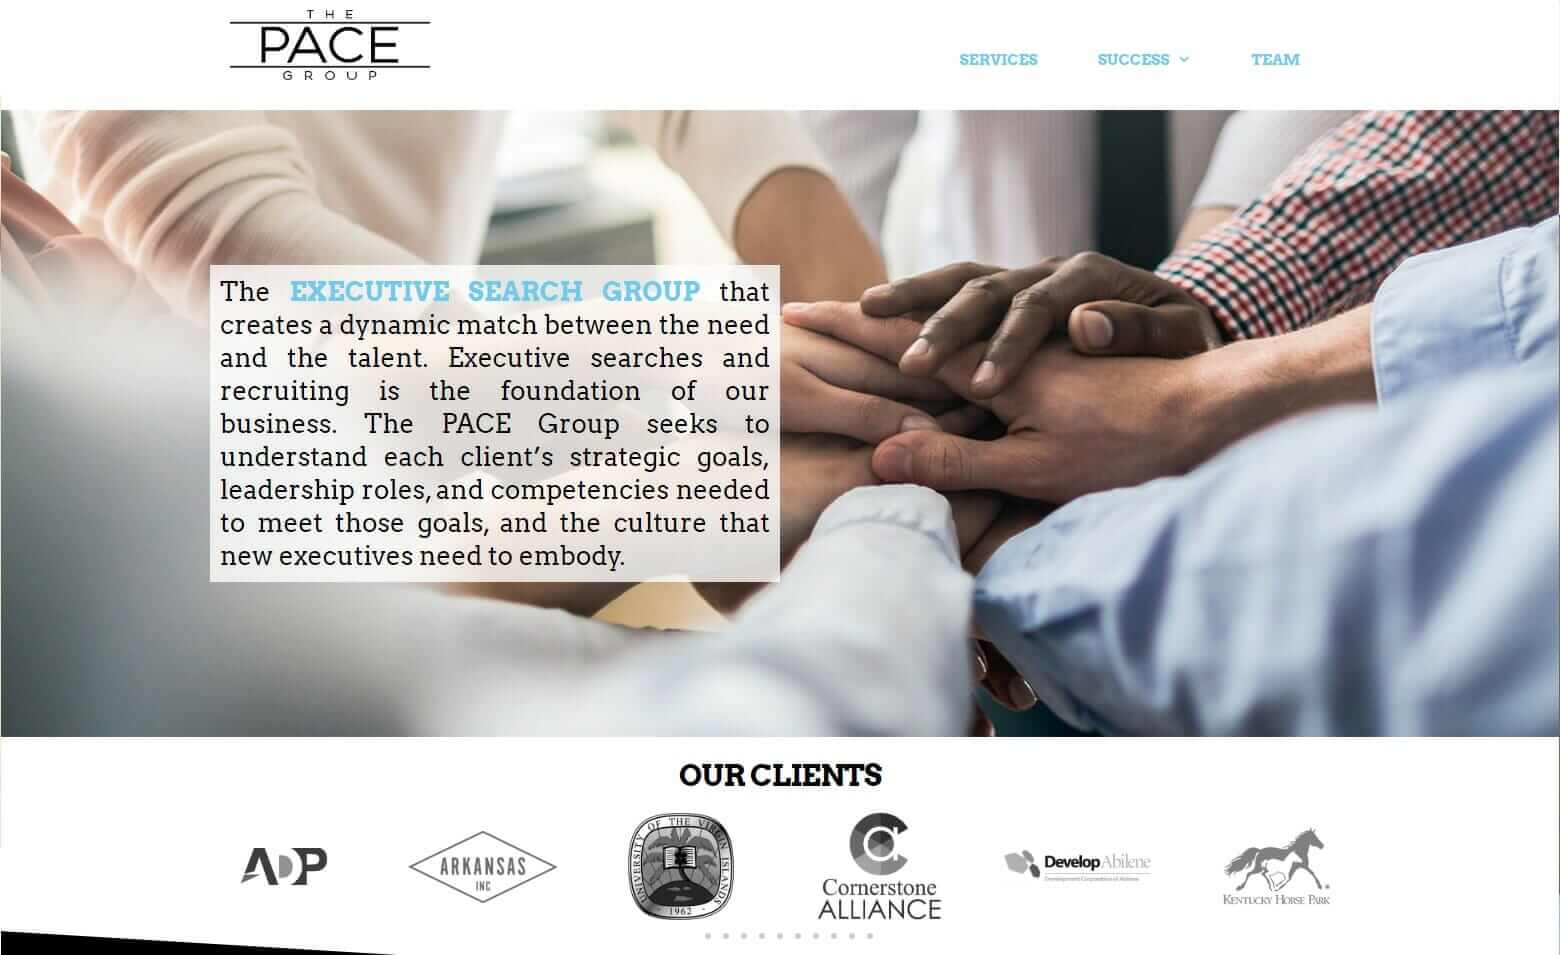 Executive head hunter website design, Dallas, Texas - the PACE Group